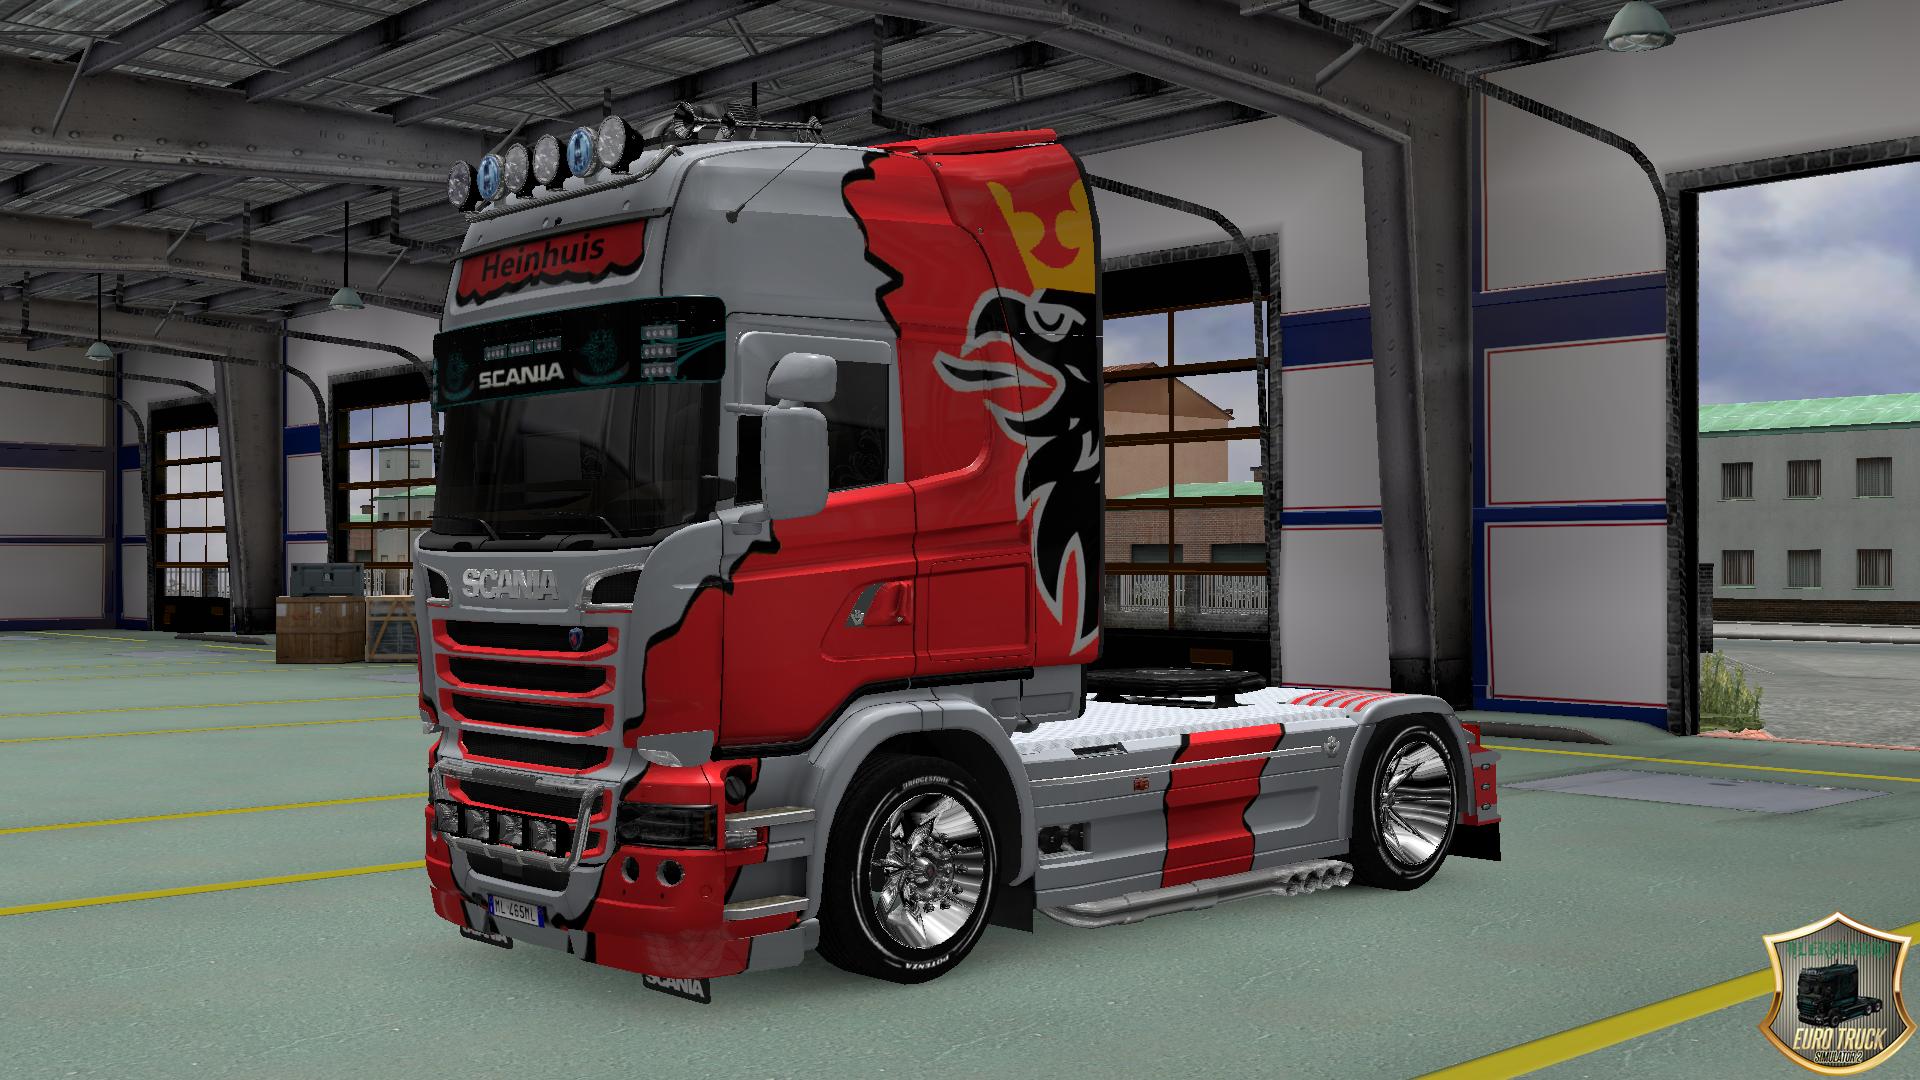 Skin Heinhuis v1 for Scania Streamline